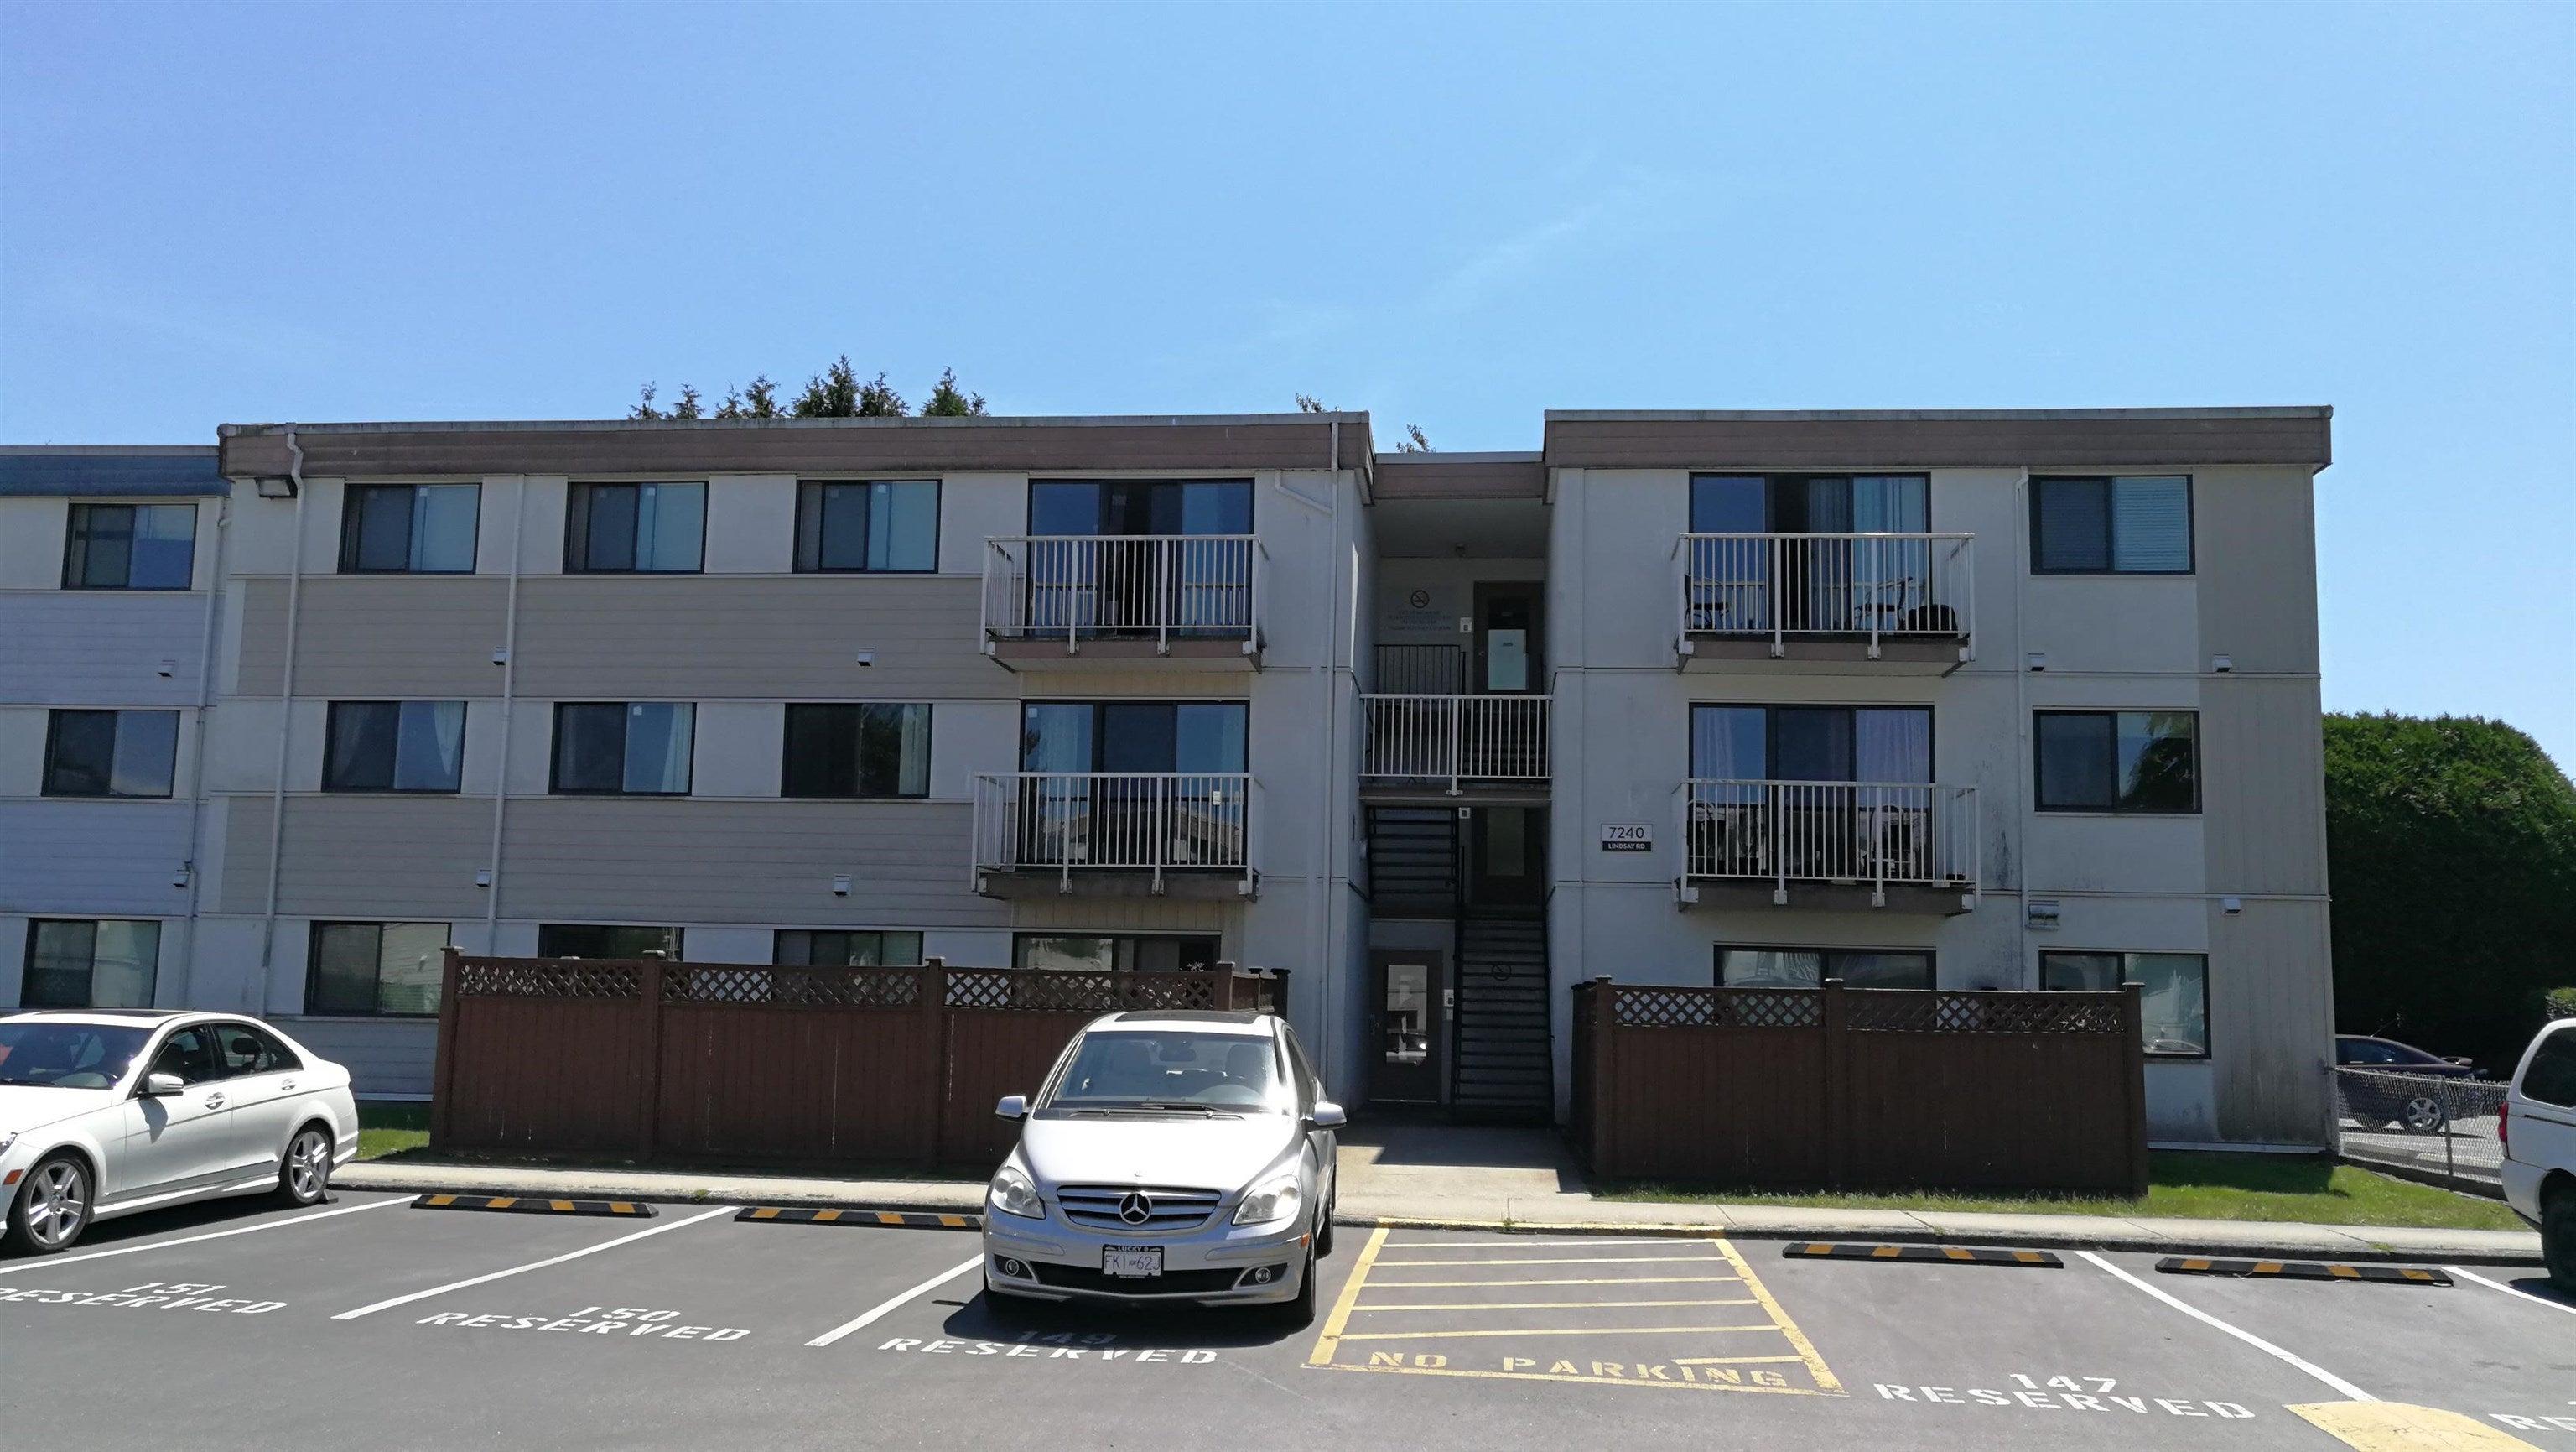 215 7240 LINDSAY ROAD - Granville Apartment/Condo for sale, 3 Bedrooms (R2626229)